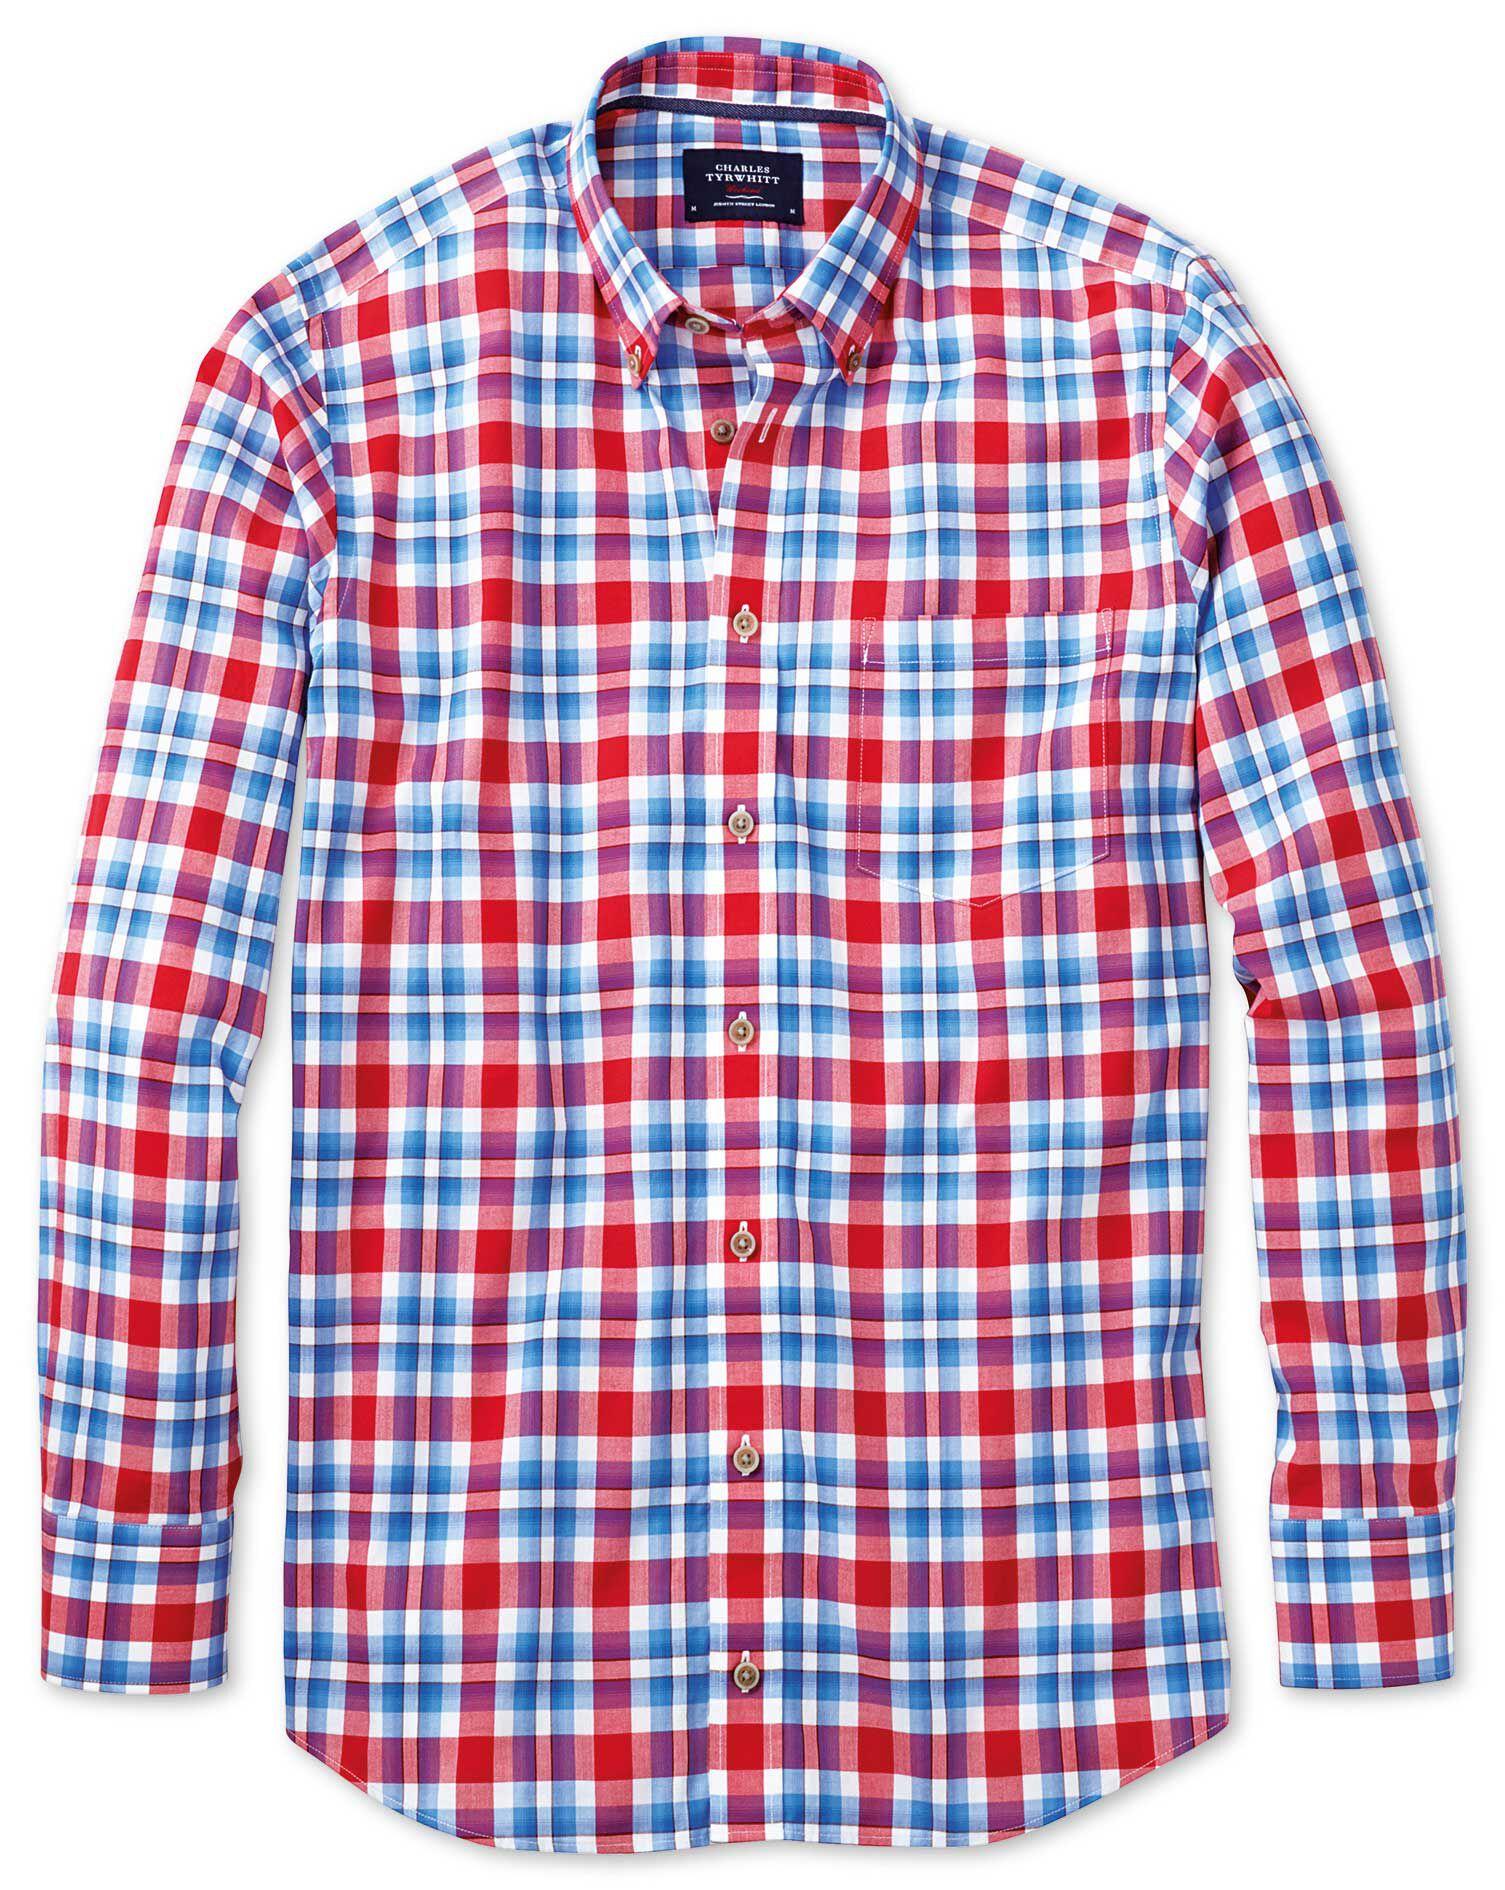 Slim Fit Poplin Sky Blue and Red Check Cotton Shirt Single Cuff Size Medium by Charles Tyrwhitt